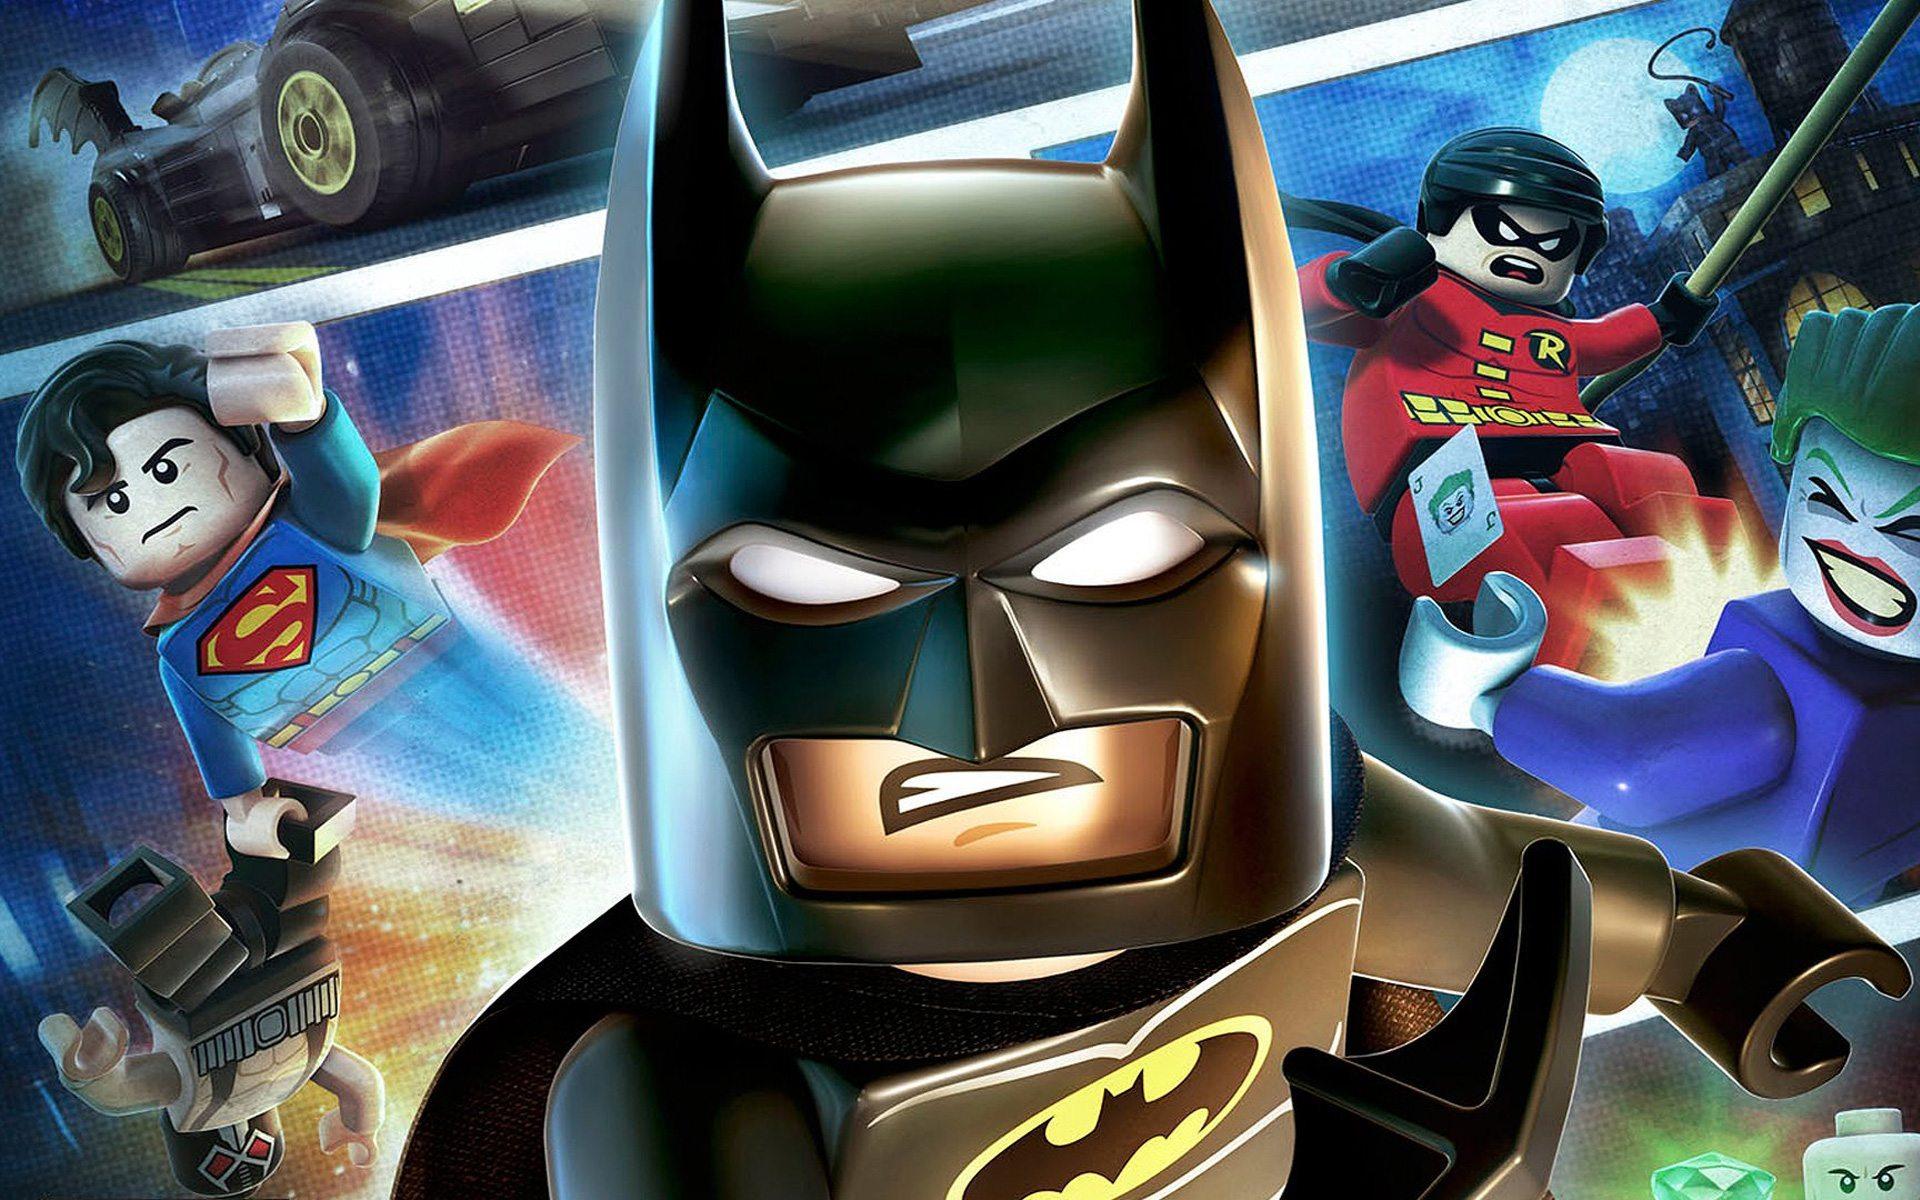 lego_batman_2_dc_superheroes-1466618-1920x1200